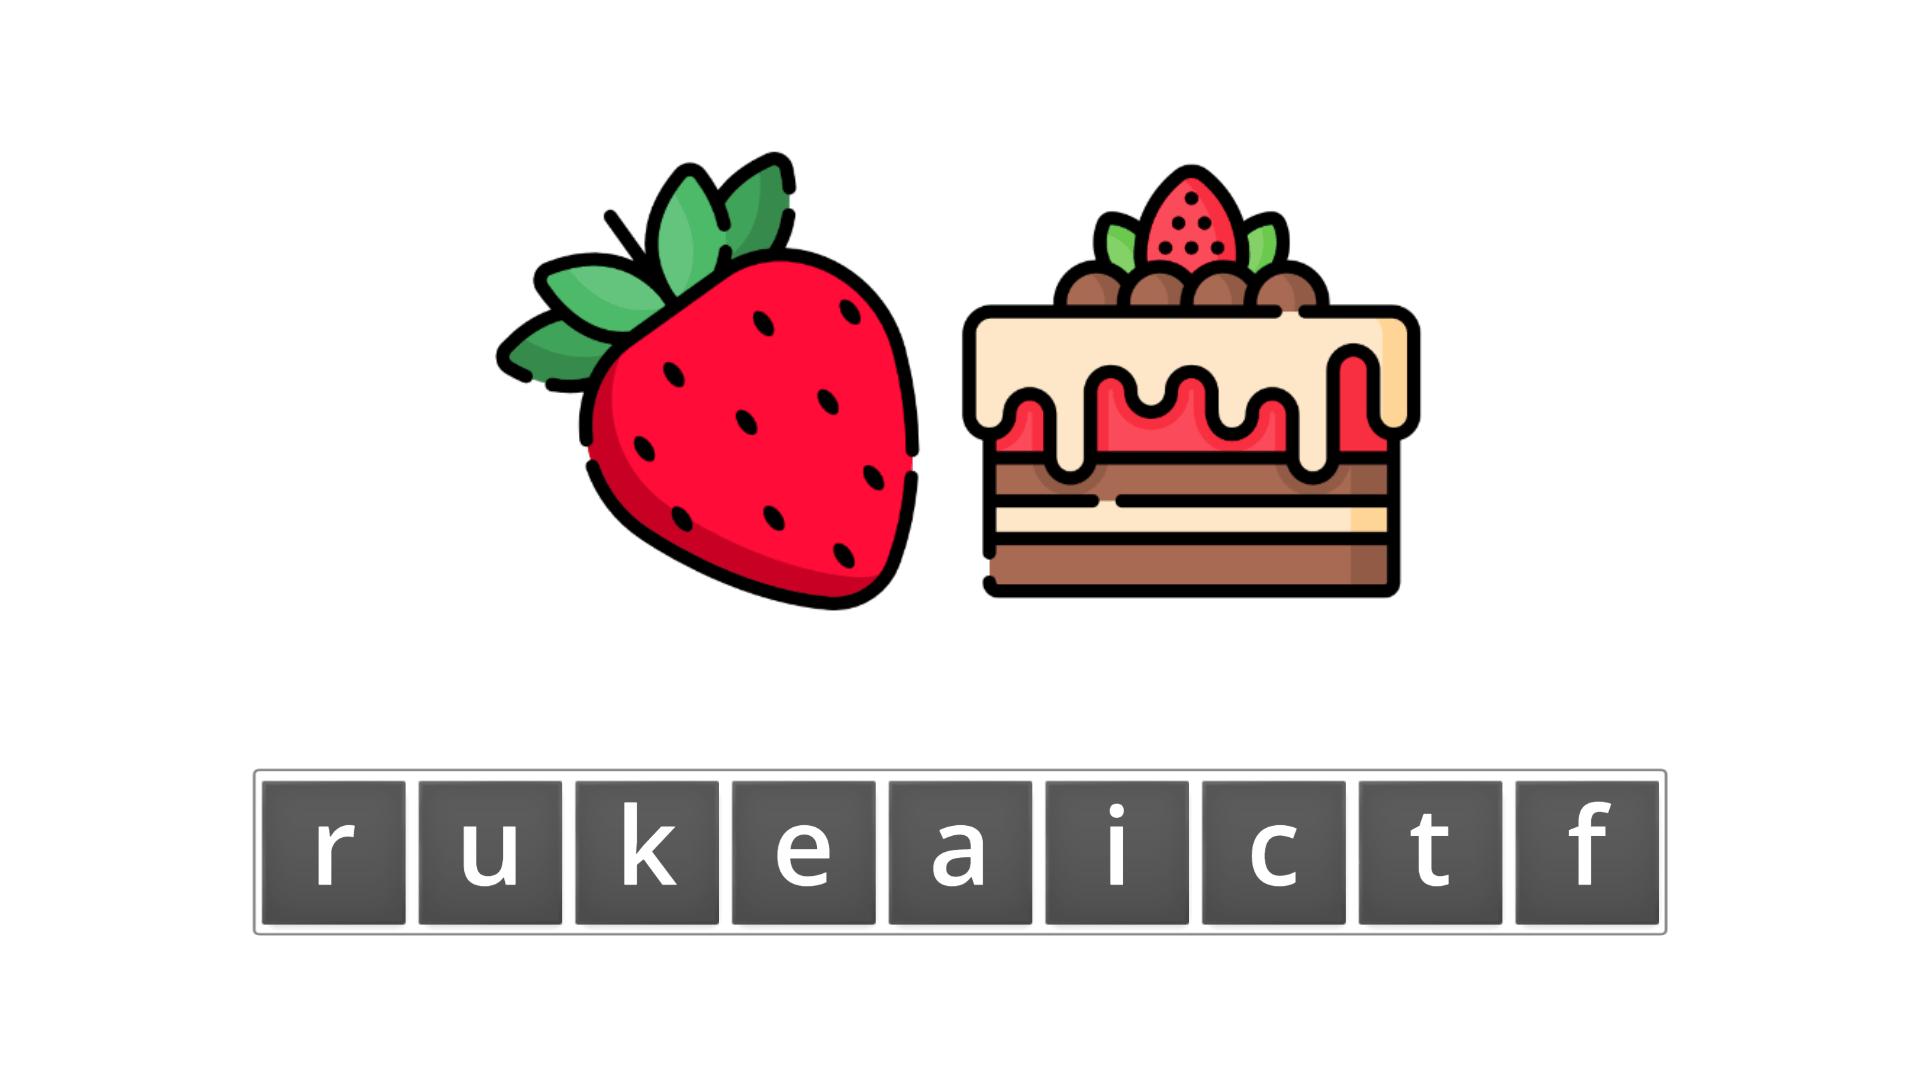 esl resources - flashcards - compound nouns - unscramble - fruitcake